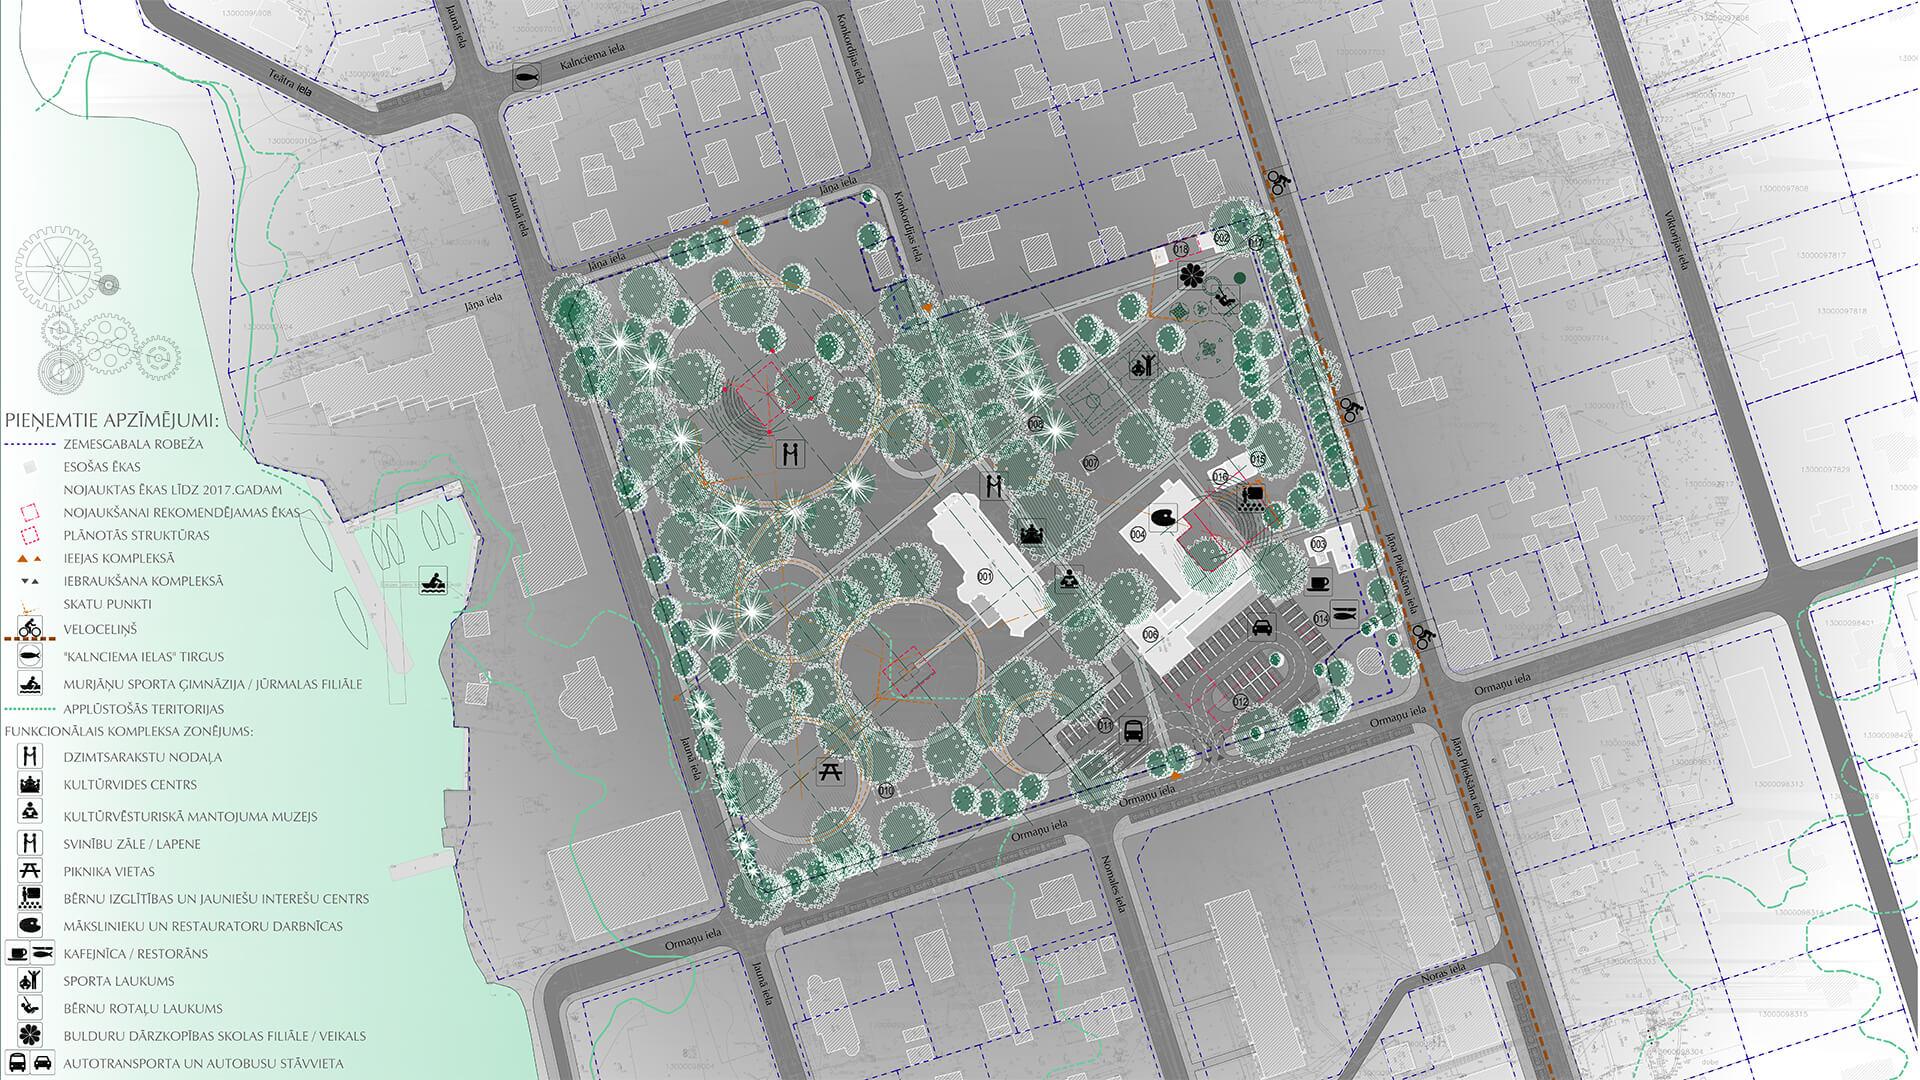 https://laagaarchitects.lv/wp-content/uploads/2019/12/02-04-3-Majoru_Muiza.jpg